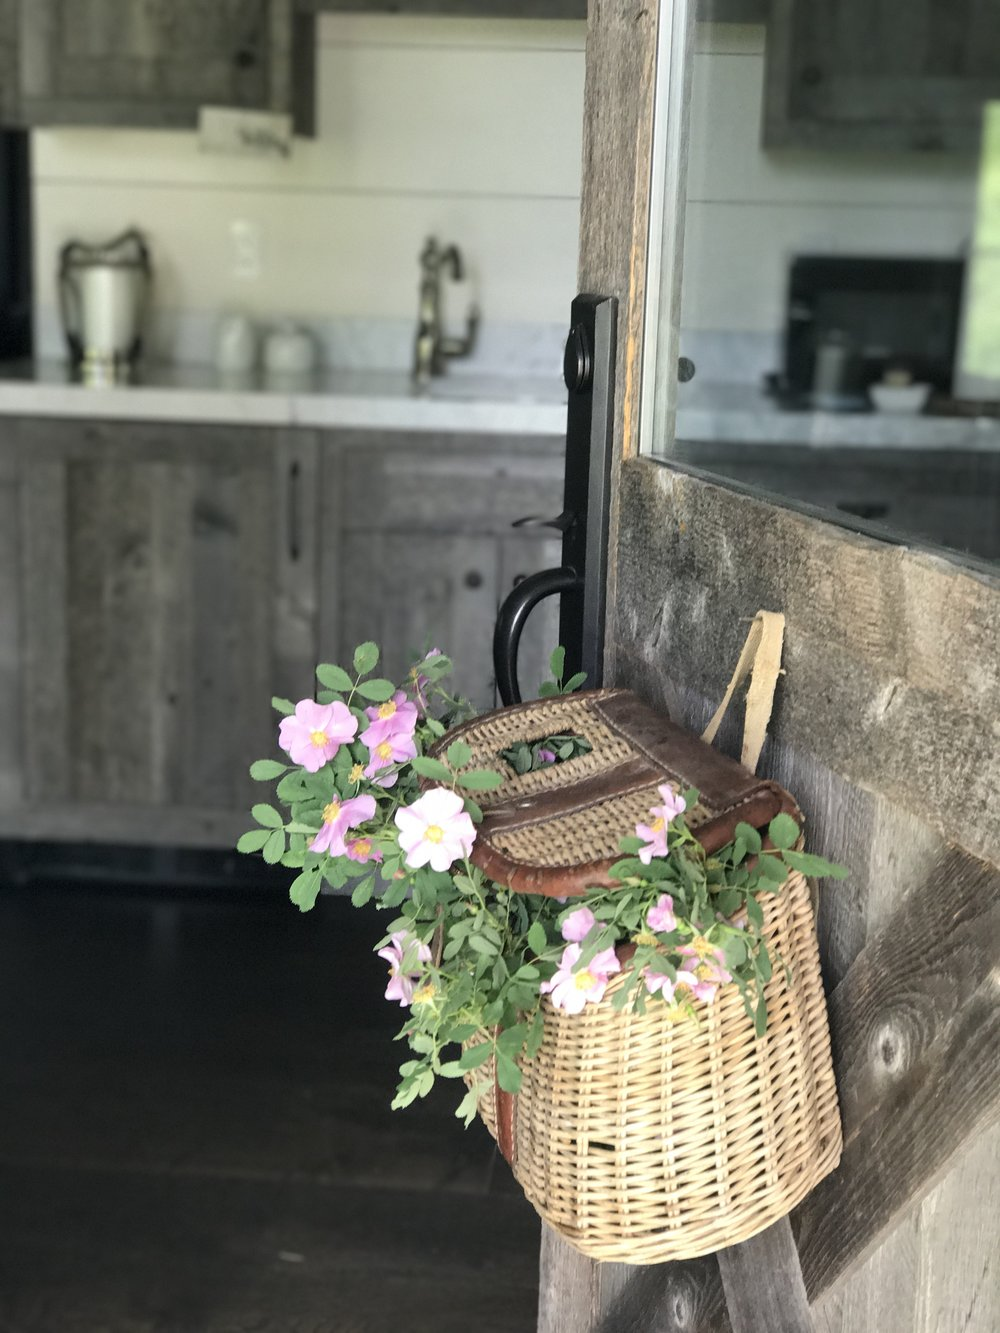 Fishing basket on a door